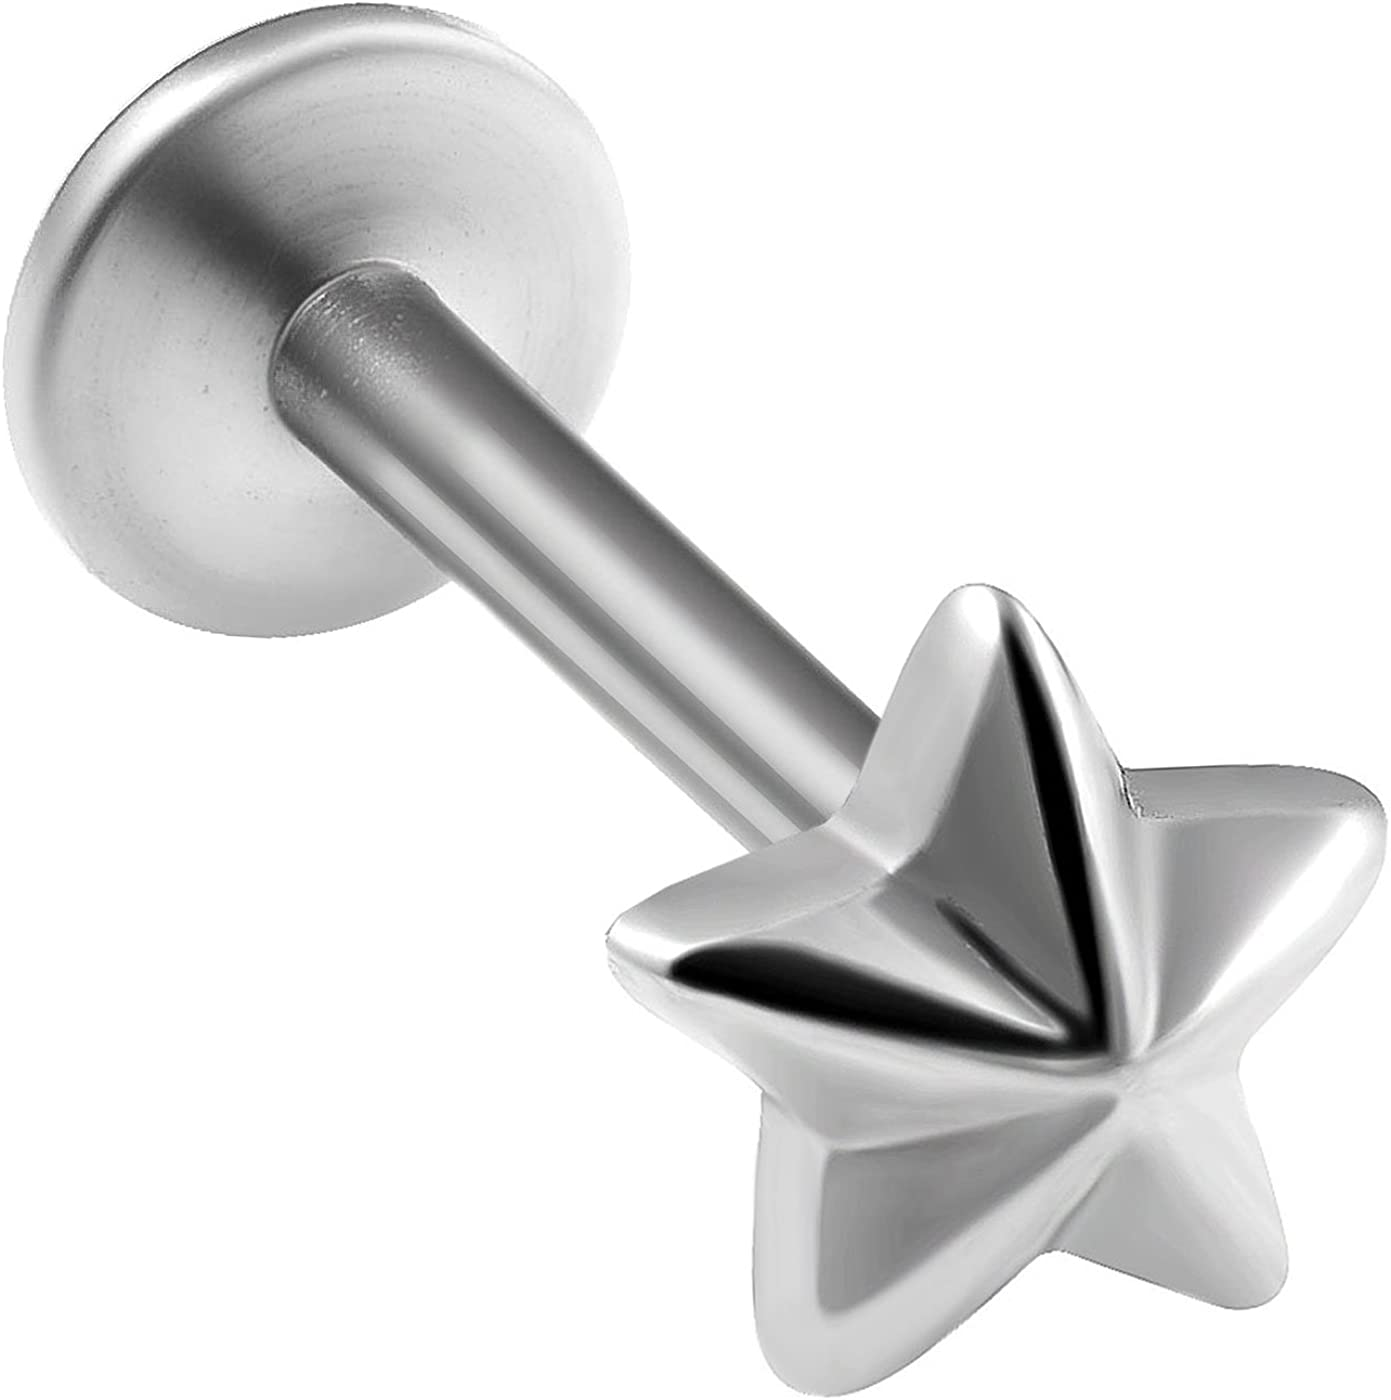 bodyjewellery 1pcs Lip Stud Earrings Dahlia Ring bite Threaded Monroe Tragus Lip Internally Stud Snake Helix Forward Star Shaped top BKAU